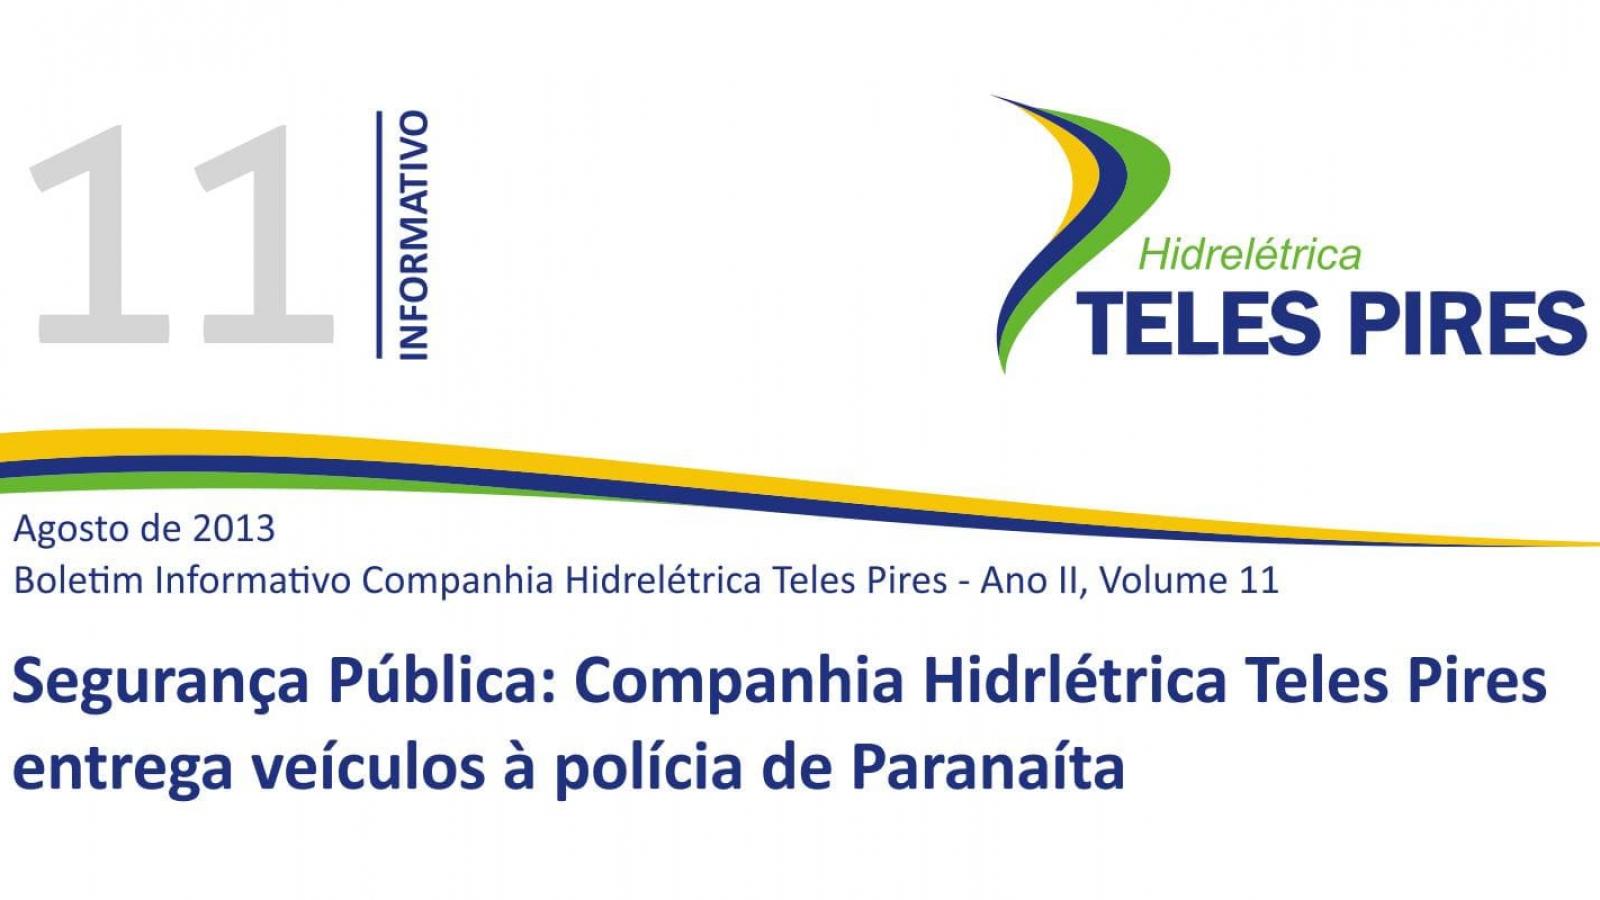 Boletim Informativo Companhia Hidrelétrica Teles Pires - Volume 11